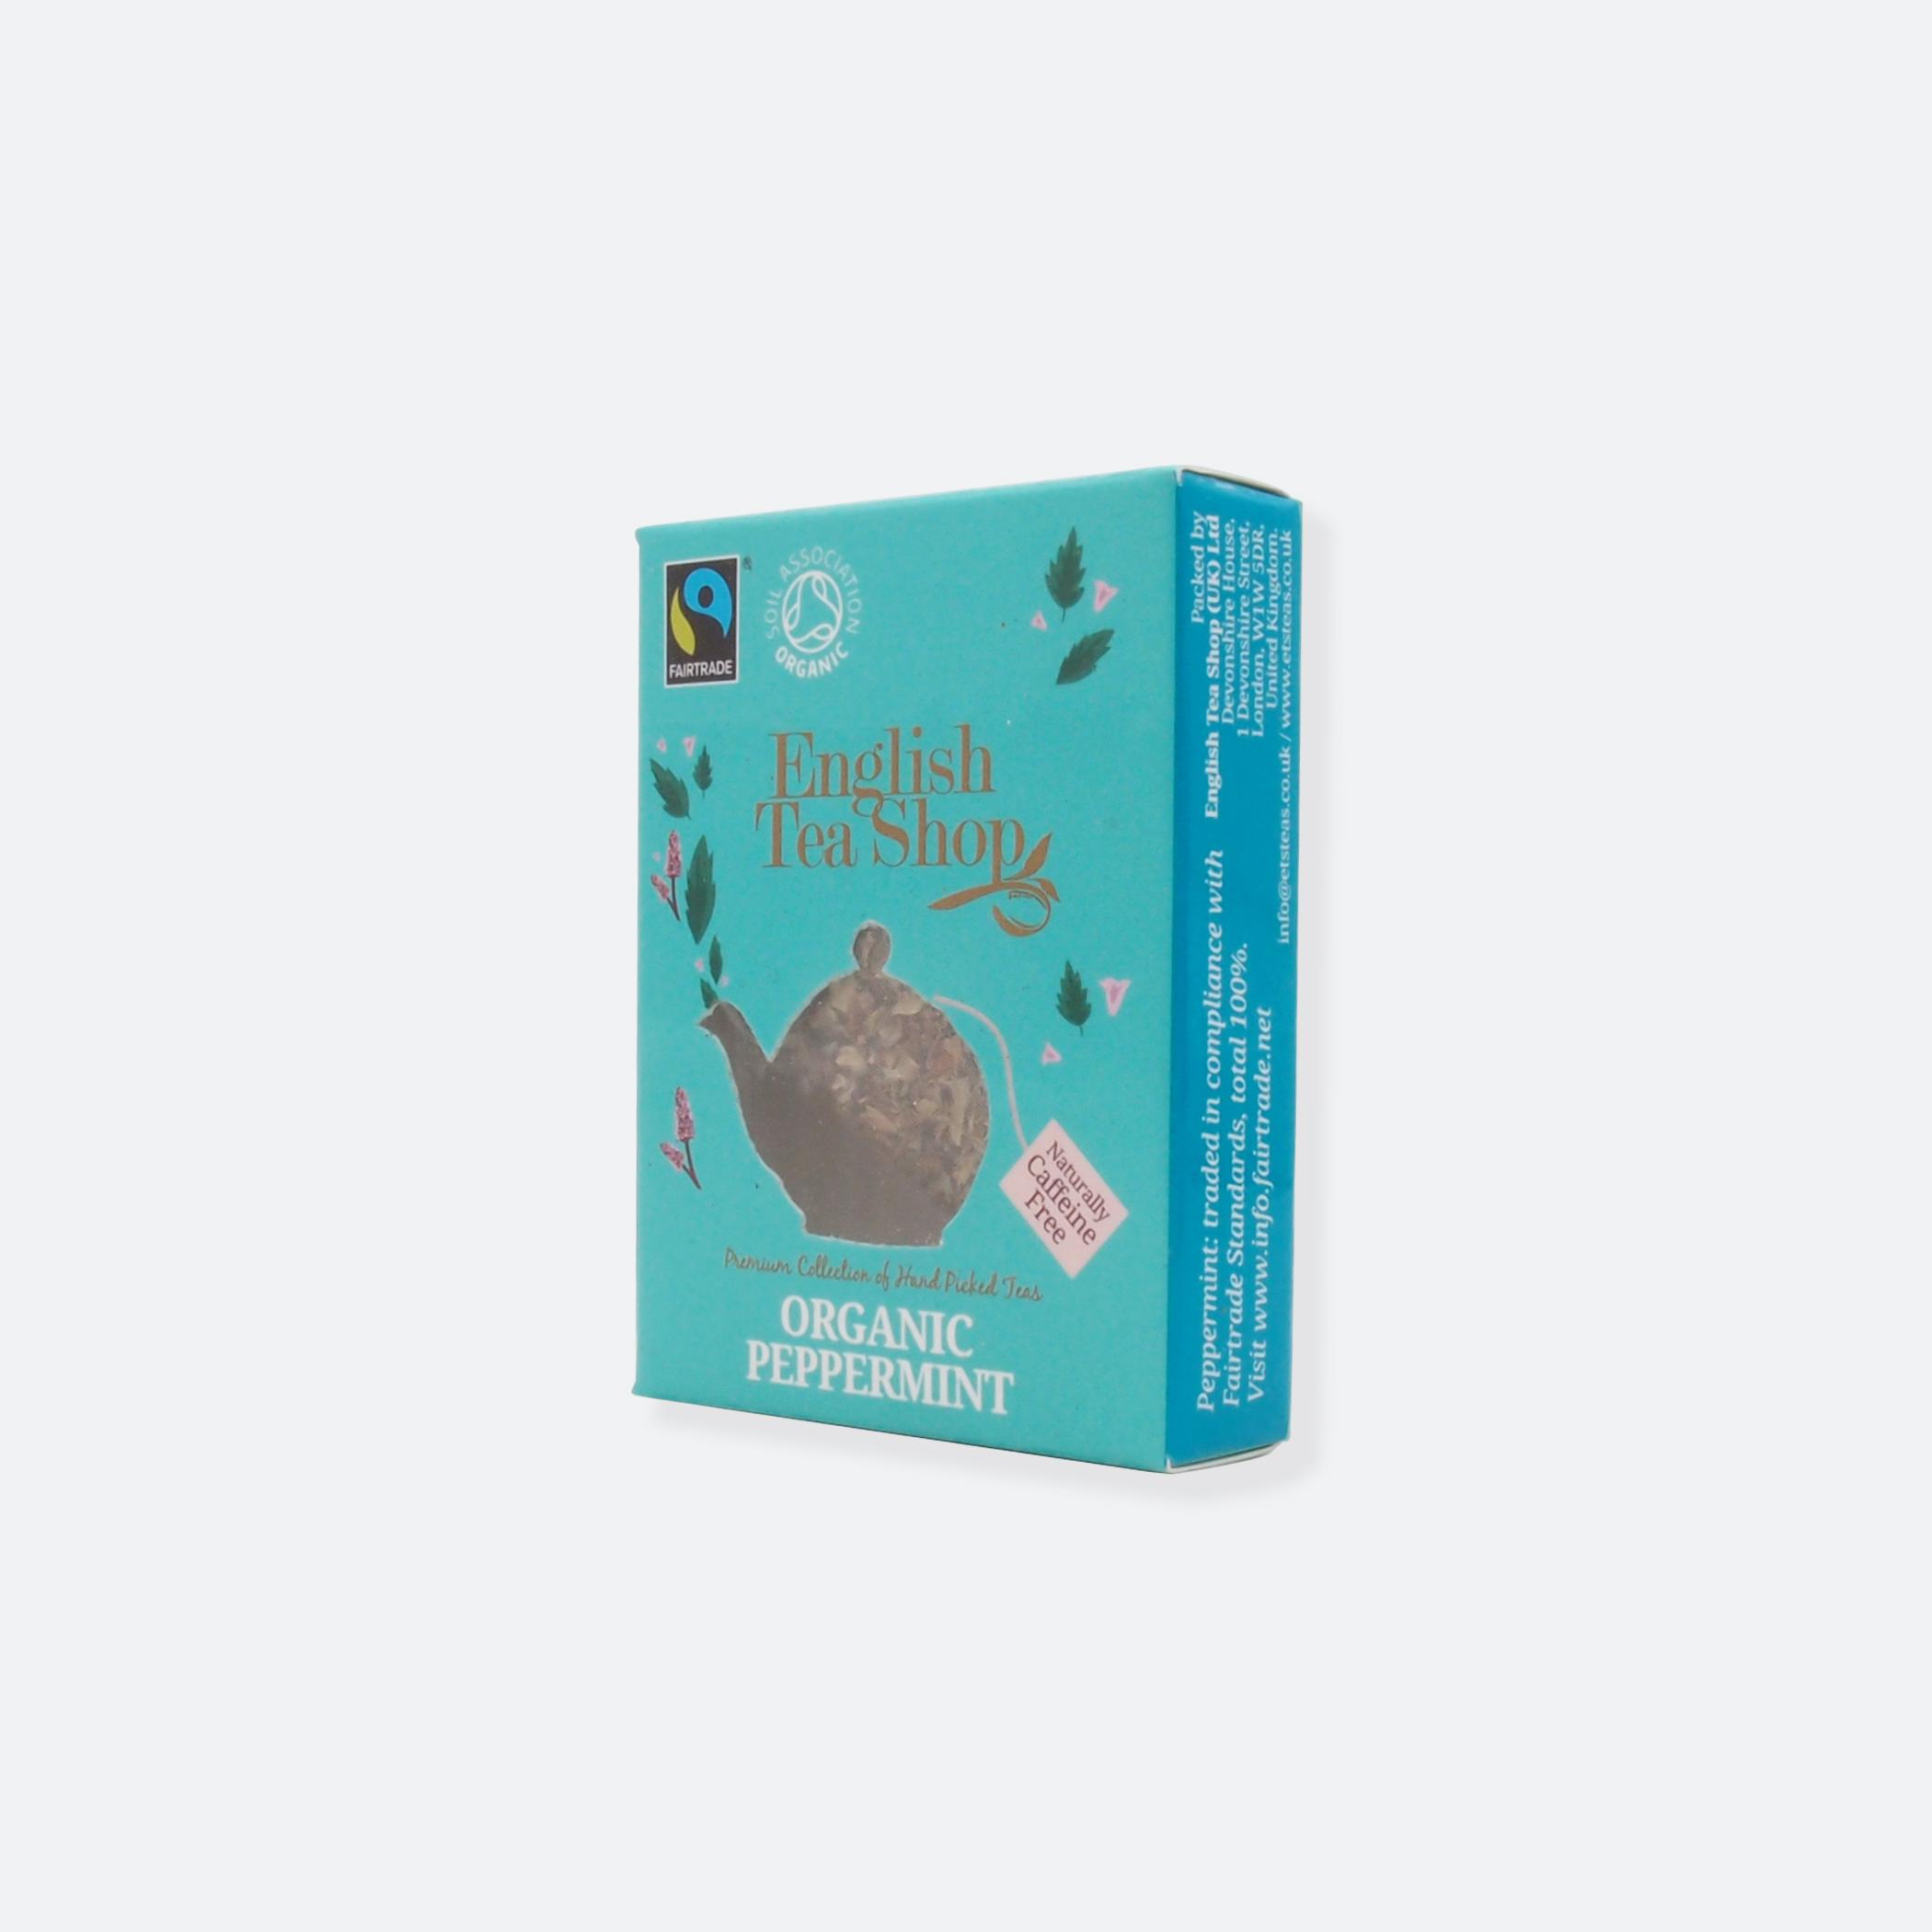 OhMart English Tea Shop - Organic Peppermint 2